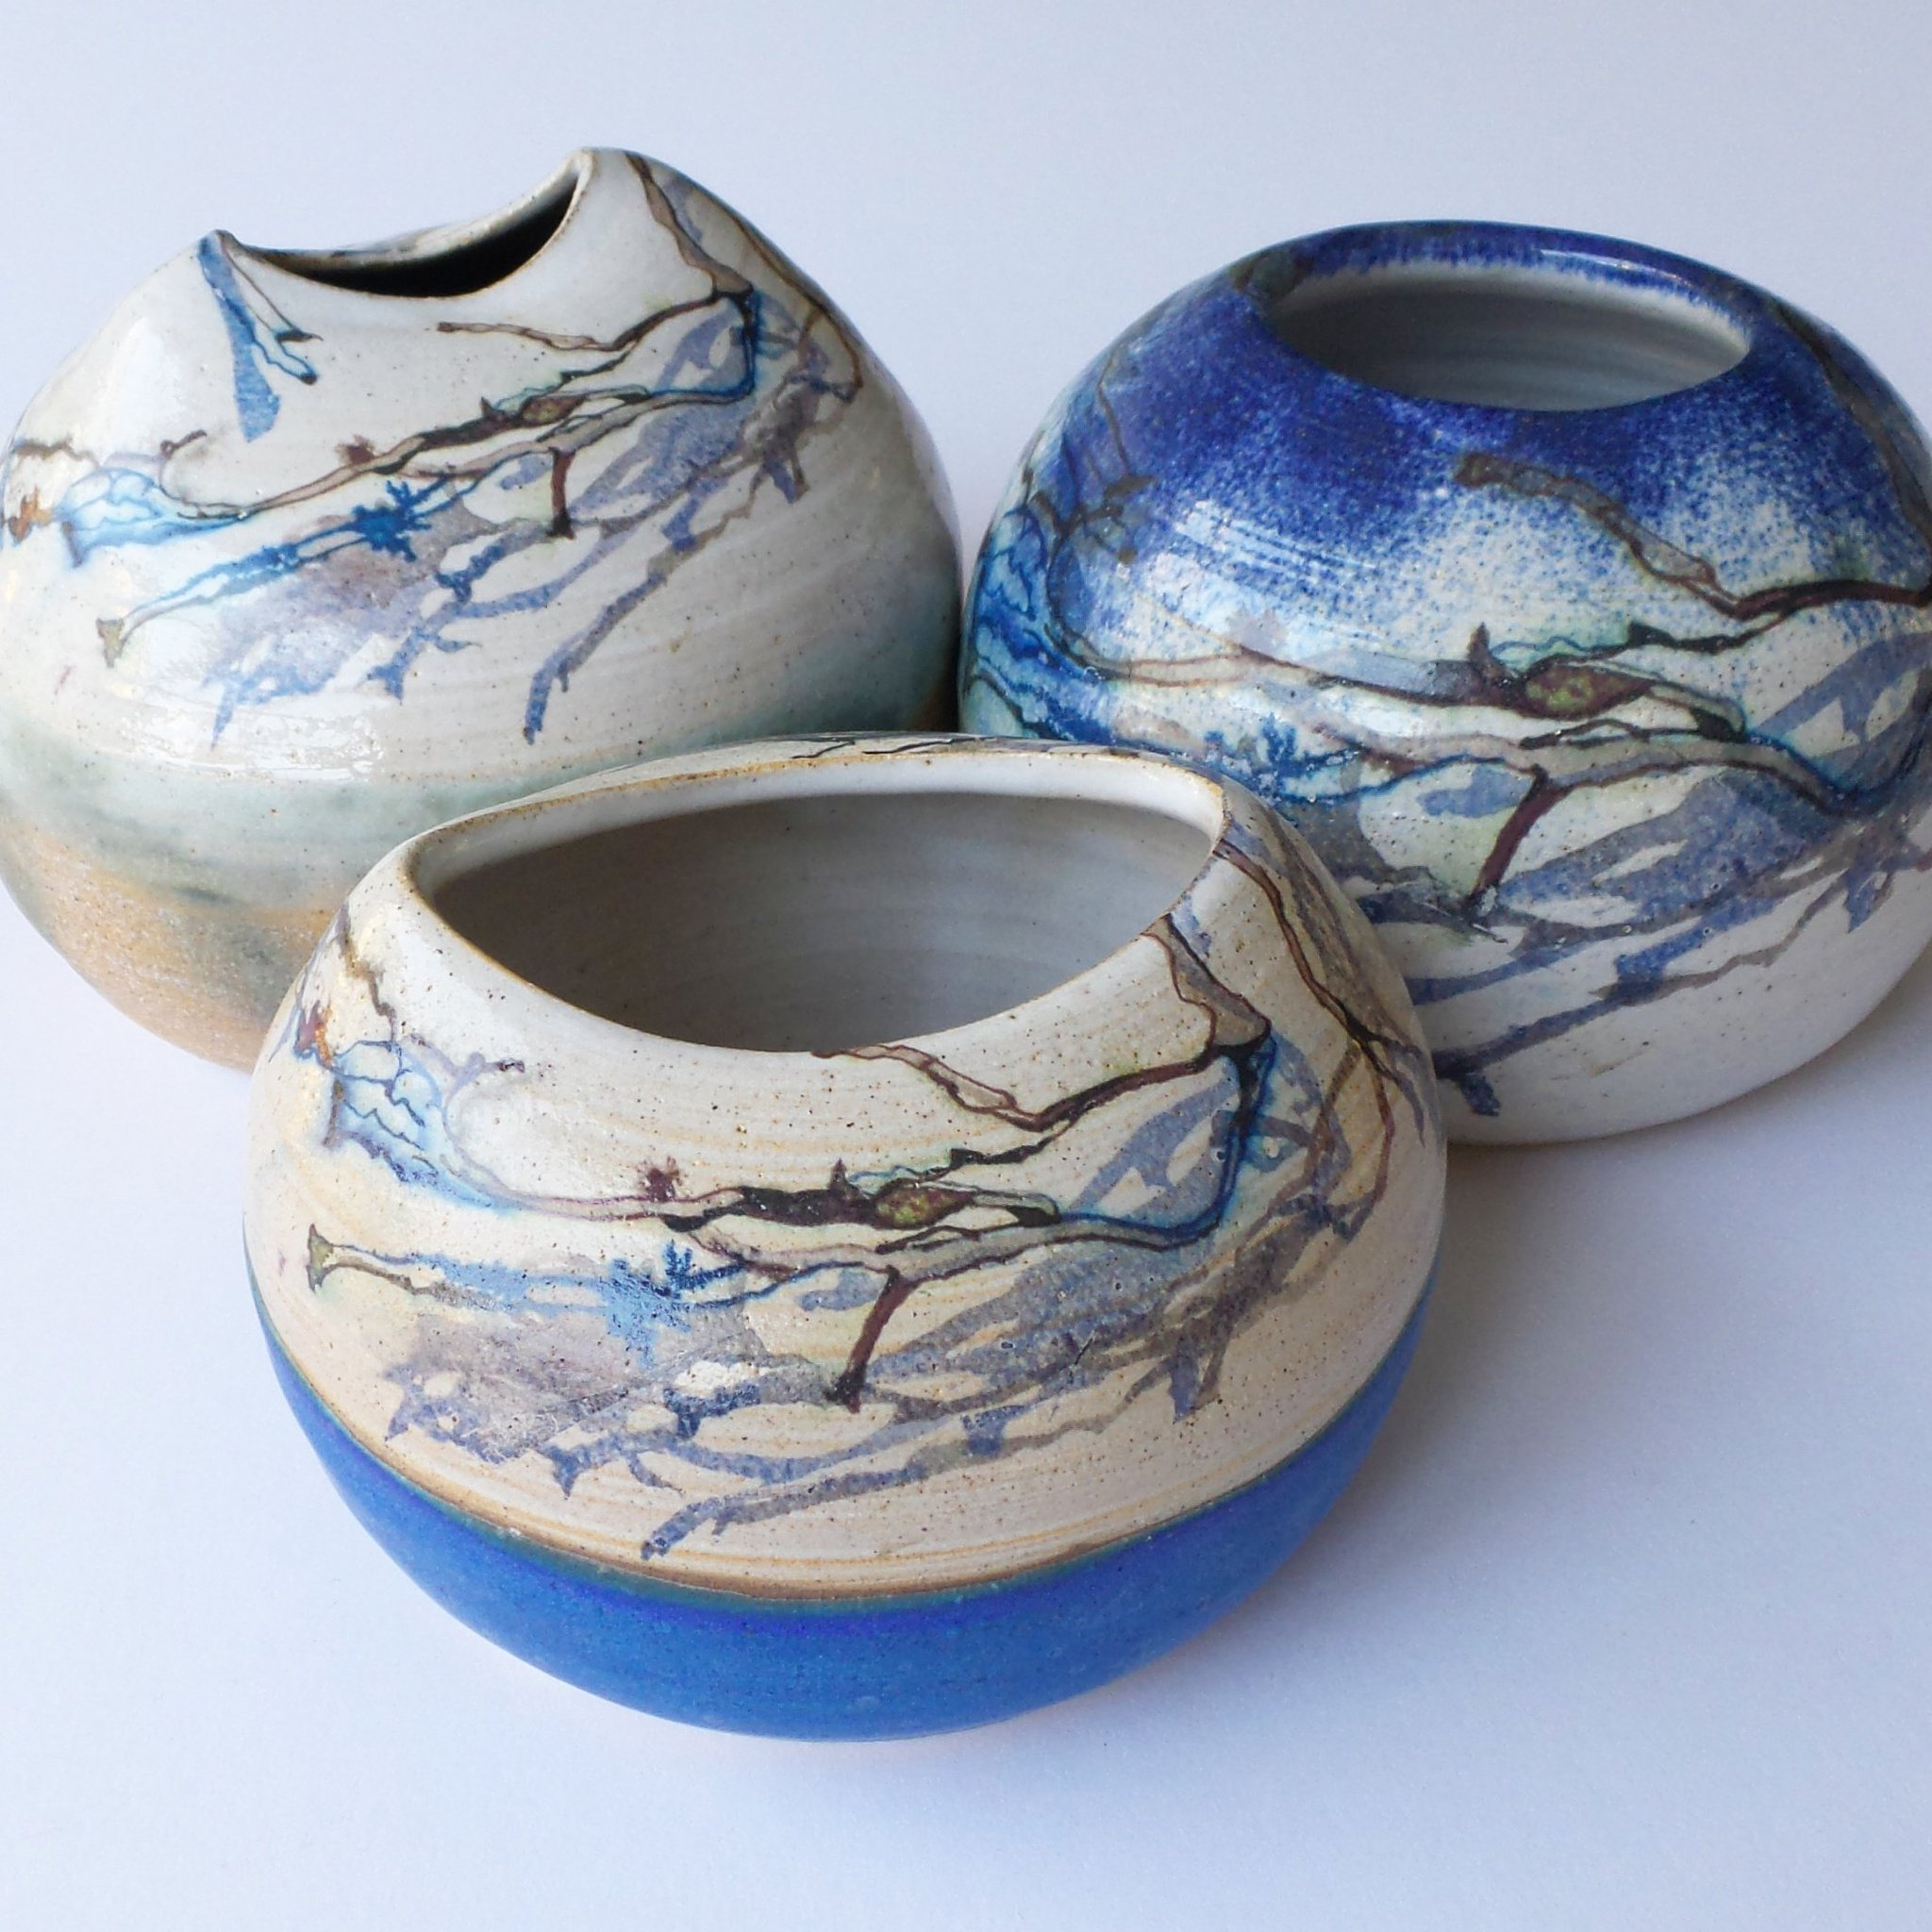 Ceramic Seaweed bud vases #design #ceramic #drawing #painting https://t.co/dtRxyVJFwN